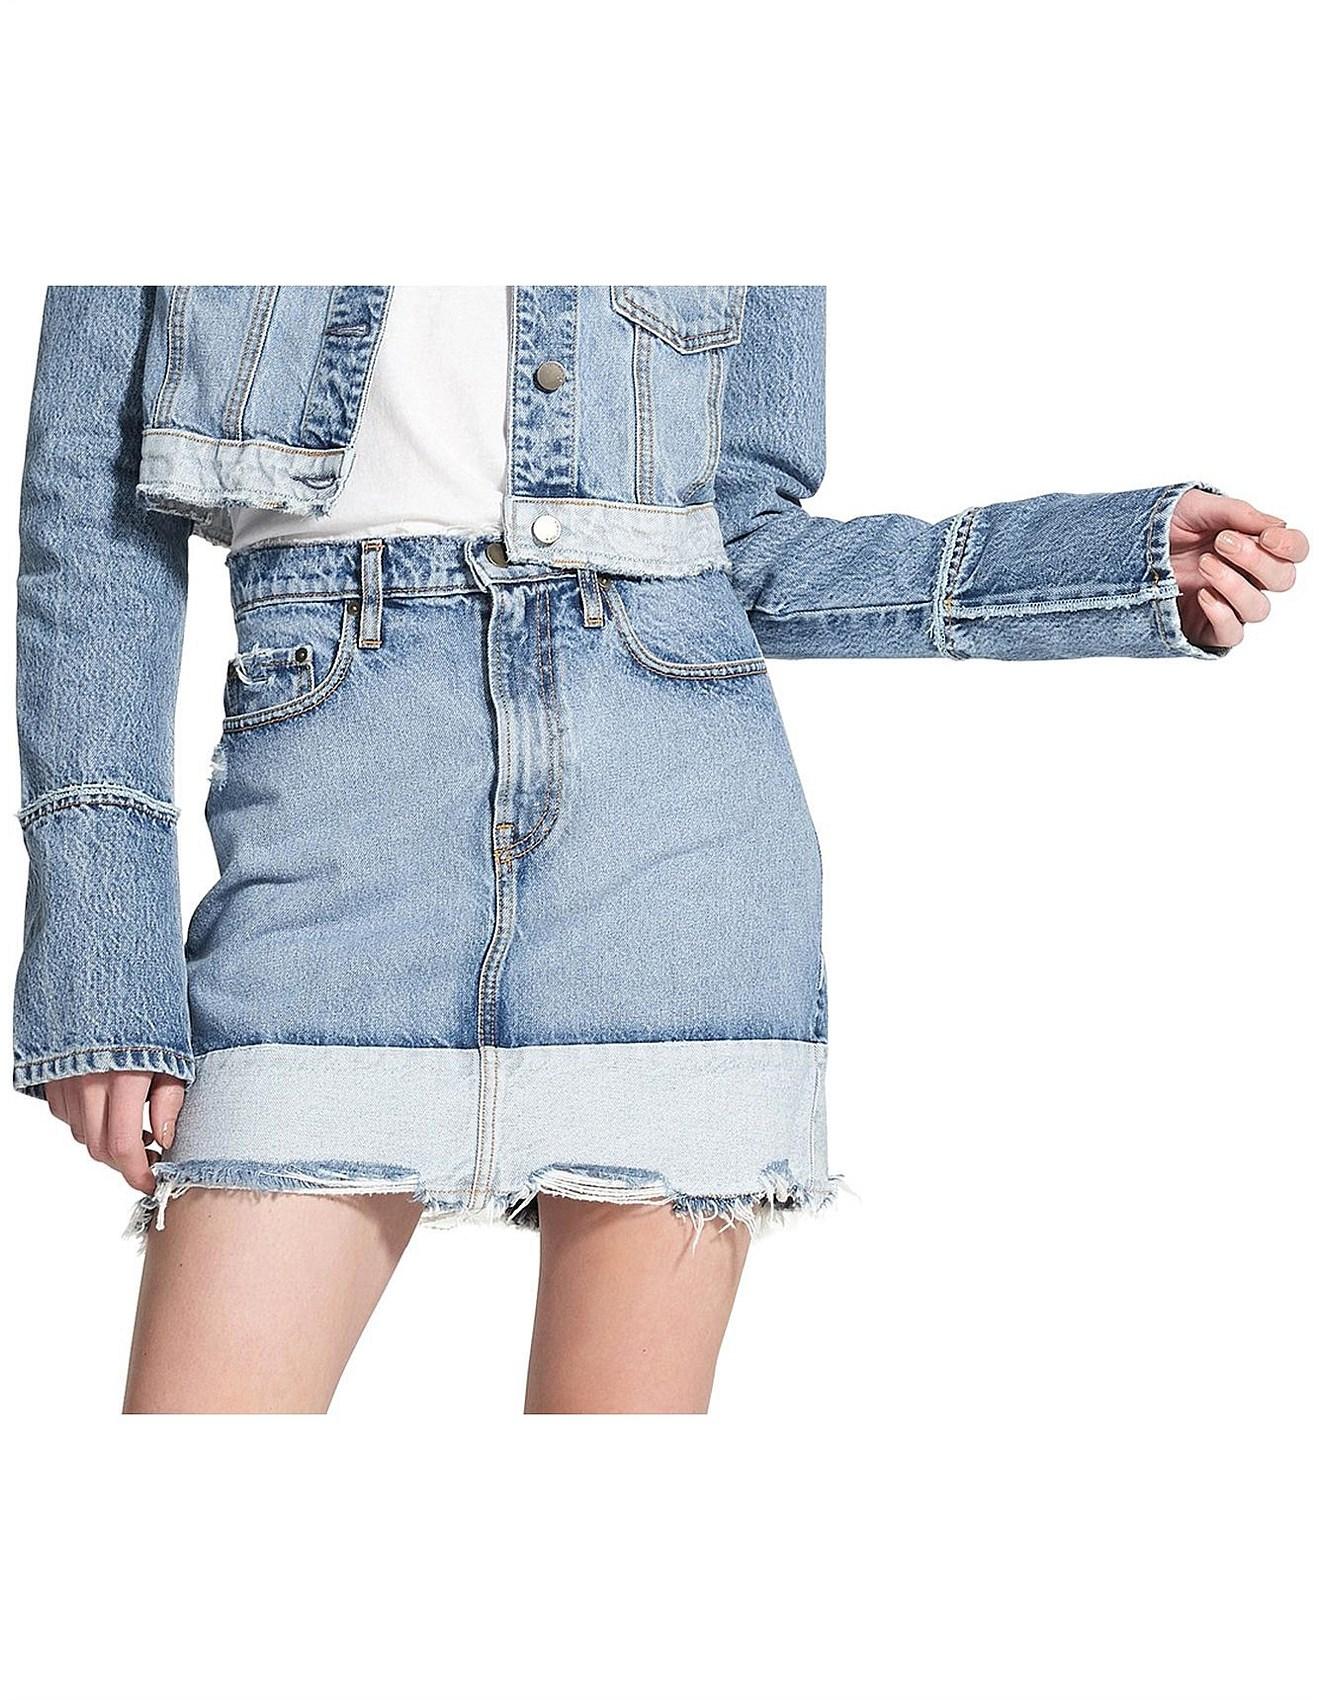 a6faa0f5d9 Nobody Denim | Buy Nobody Denim Online | David Jones - Reverse Skirt